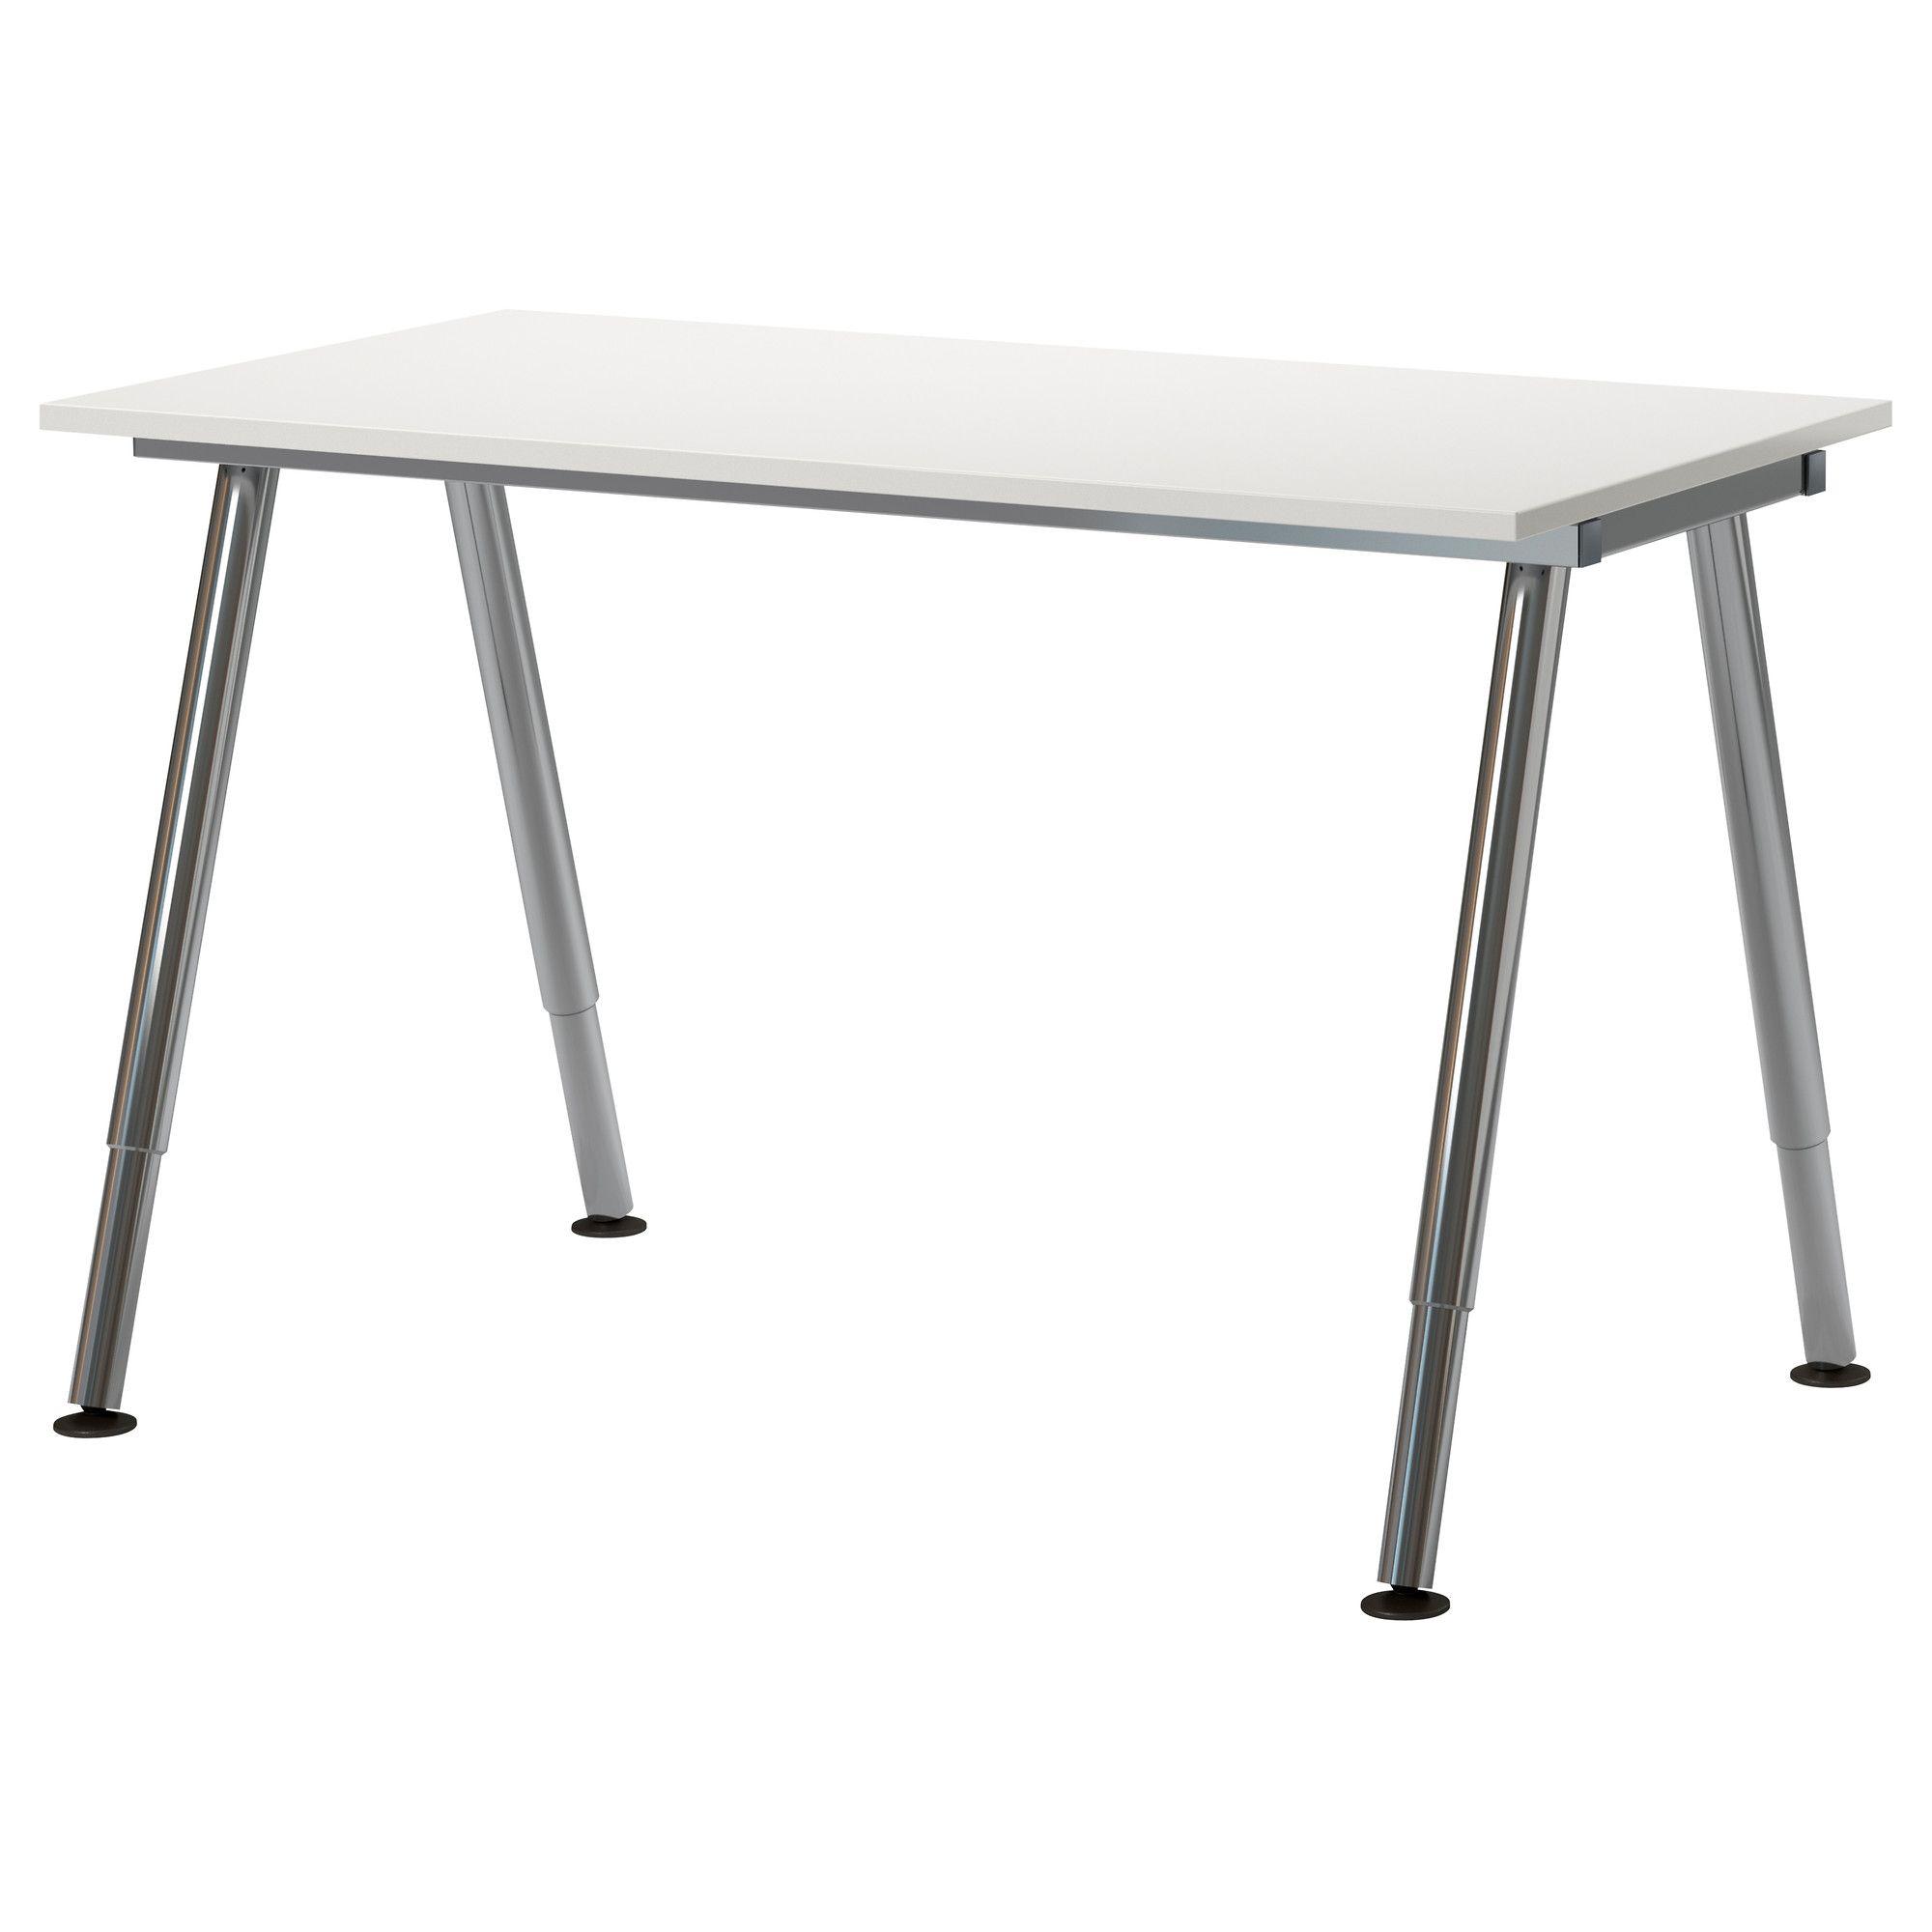 GALANT Desk - white, A-leg, chrome plated - IKEA | New ...